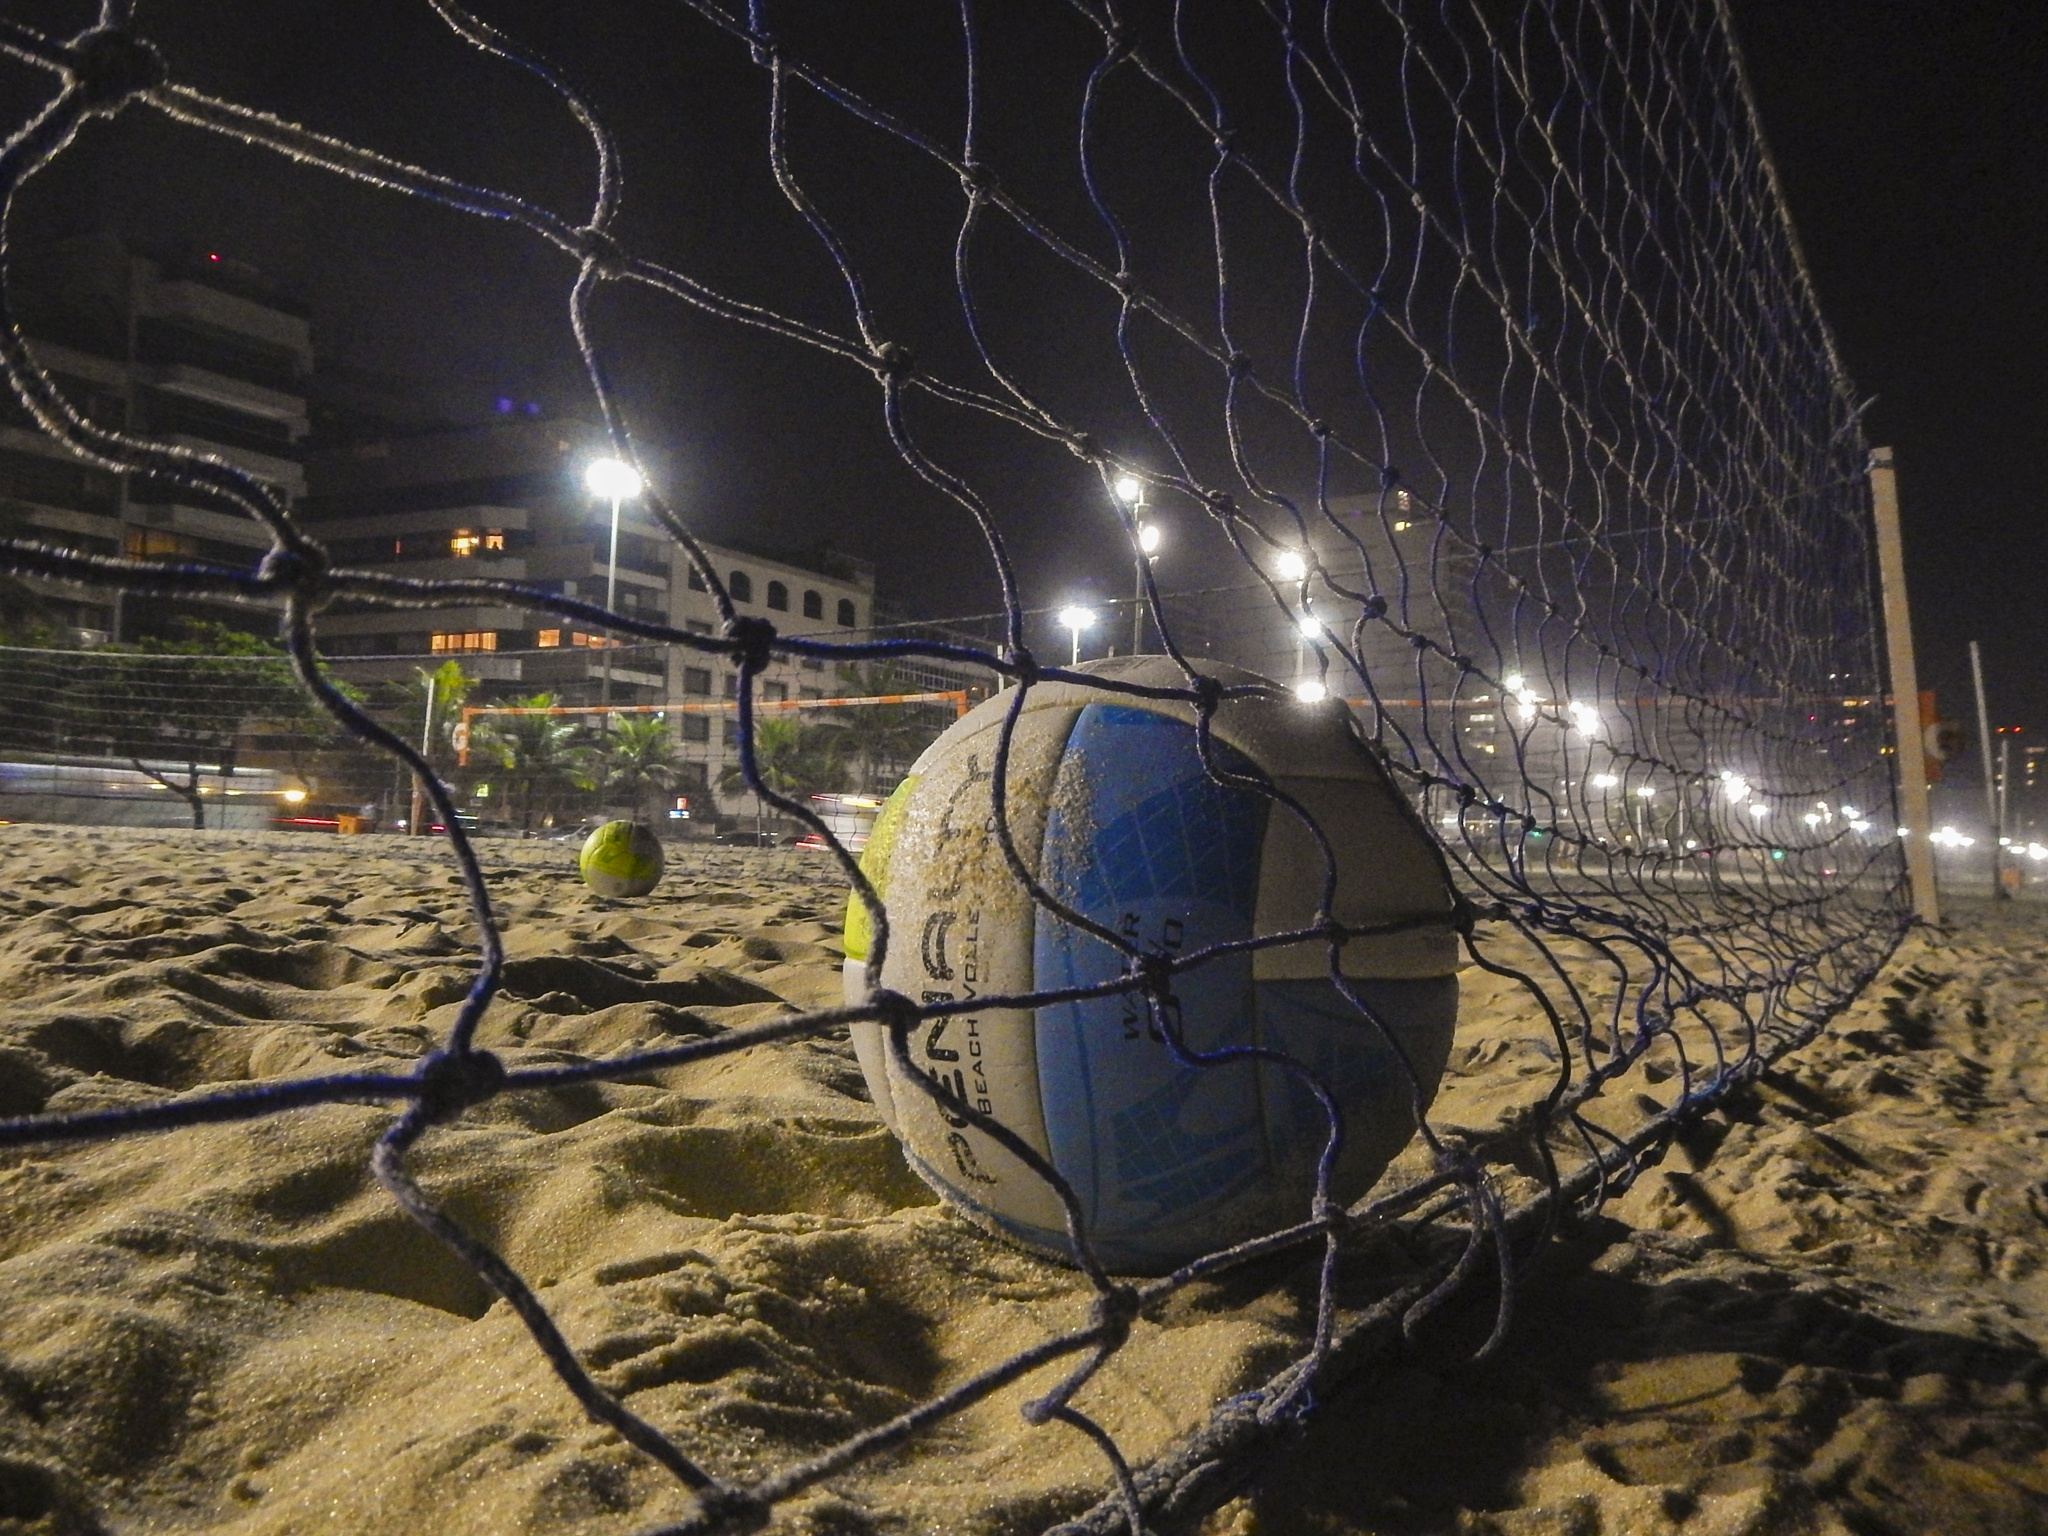 Ipanema beach at night by Marcelo Zal Riani